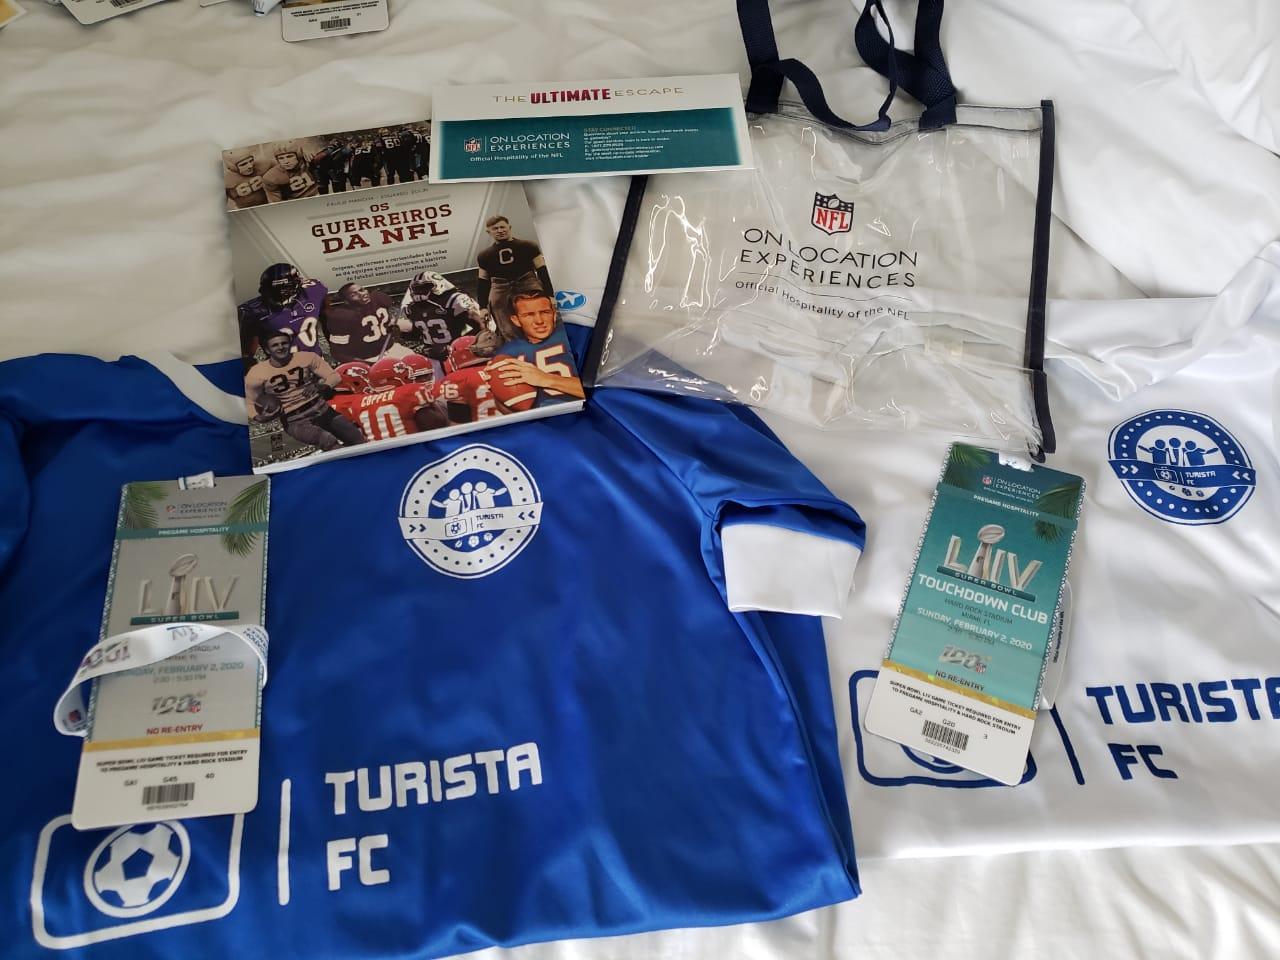 Camisas Turista FC e ingressos SB54